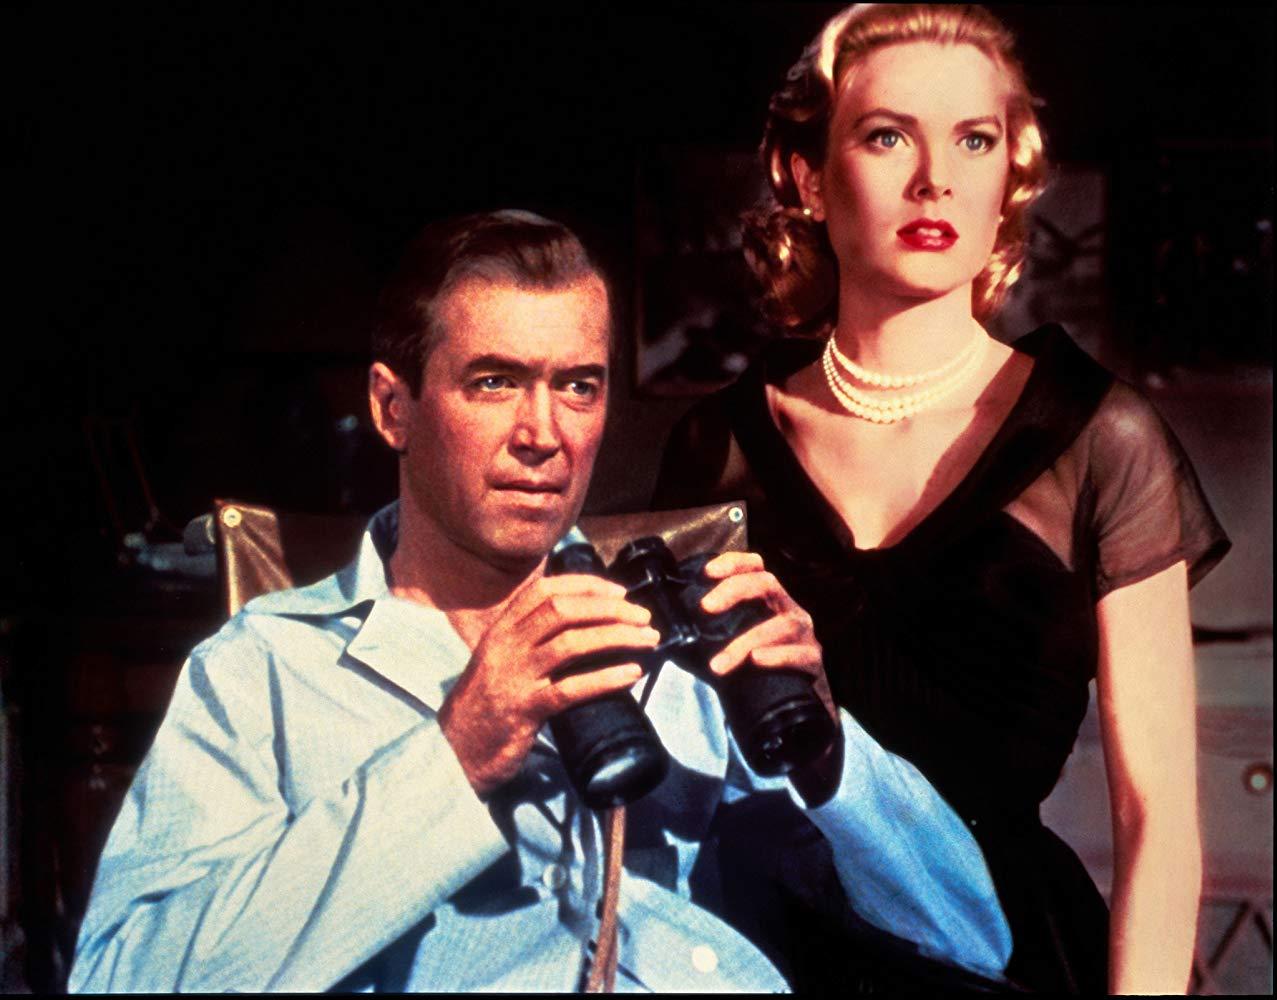 Rear Window 1954sdf - 10 فیلم برتر و شاهکار آلفرد هیچکاک بر اساس امتیاز IMDb